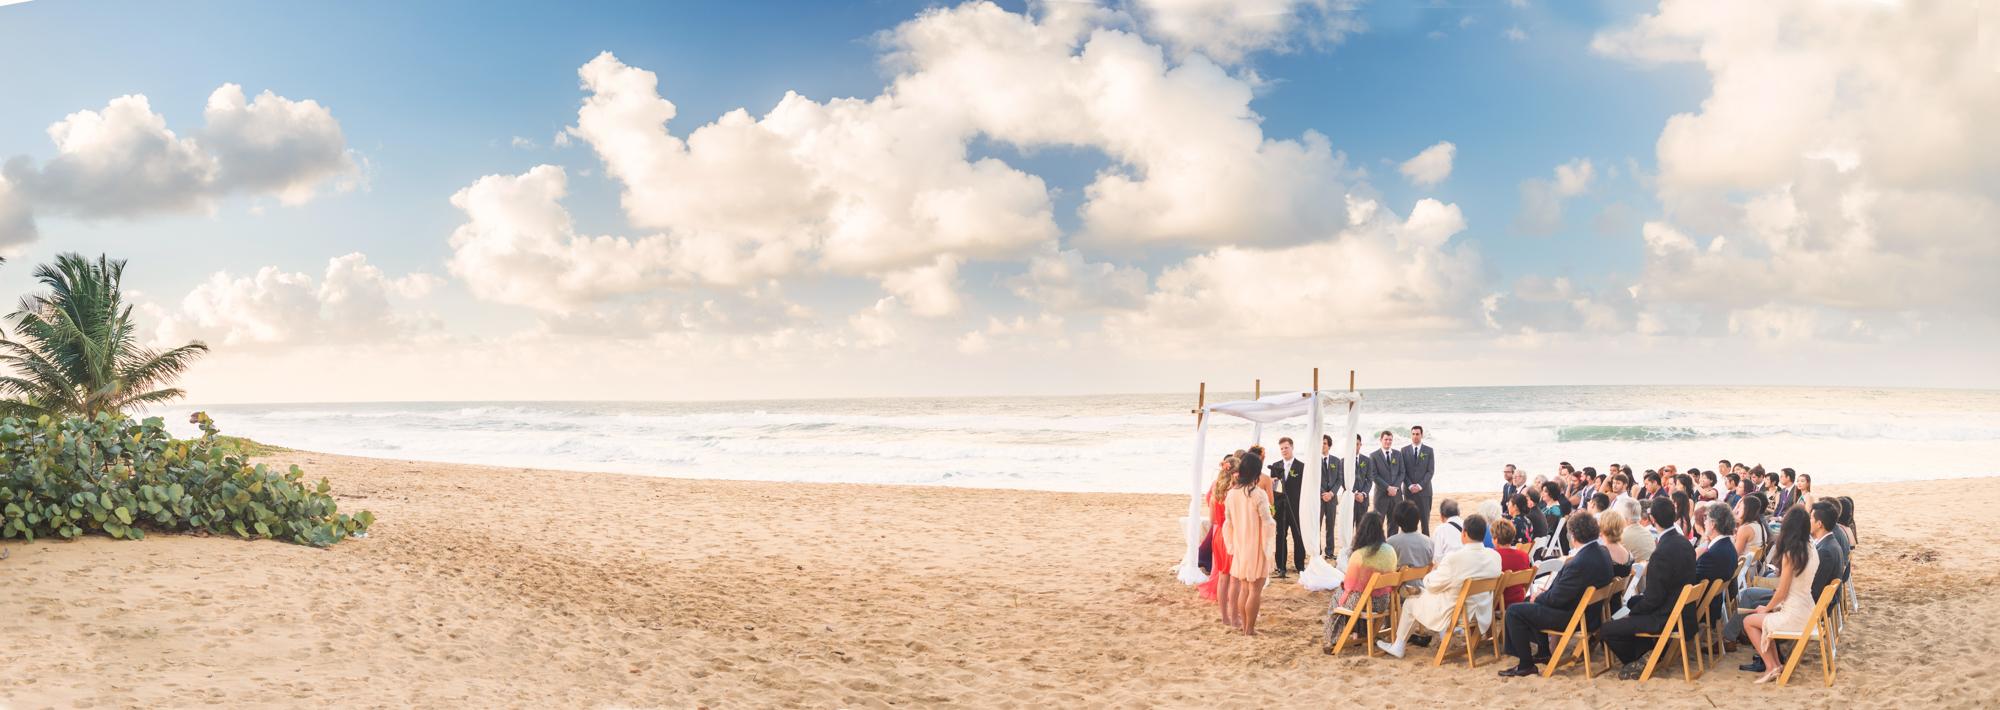 Yifan_Zhang_Geoff_Oberhofer_Carlin_Ma_wedding--49.jpg